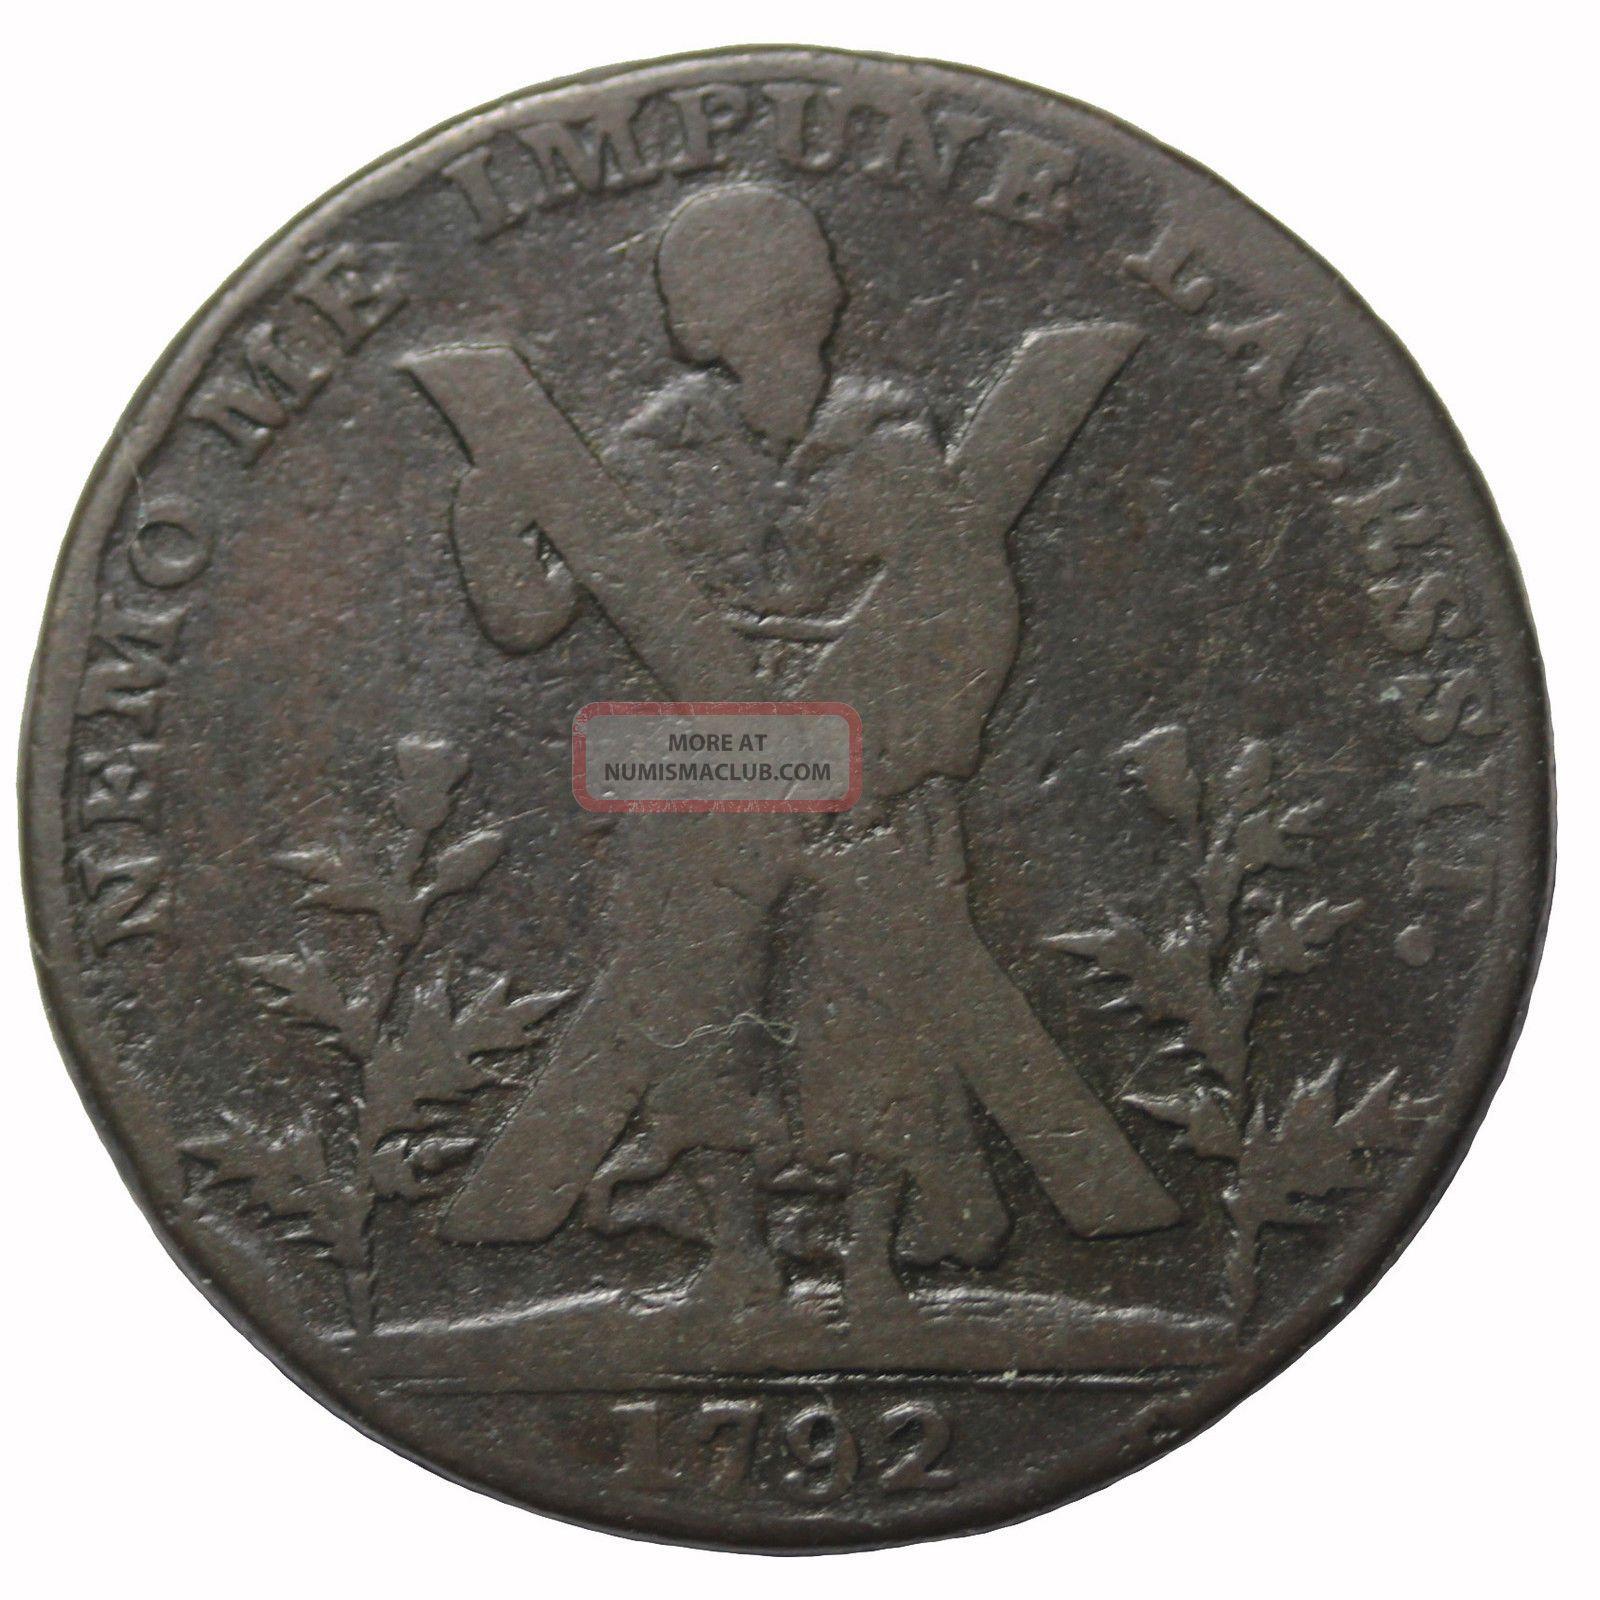 1792 Scotland Lothian Edinburgh Hutchisons Halfpenny Conder Token Dh - 41 UK (Great Britain) photo